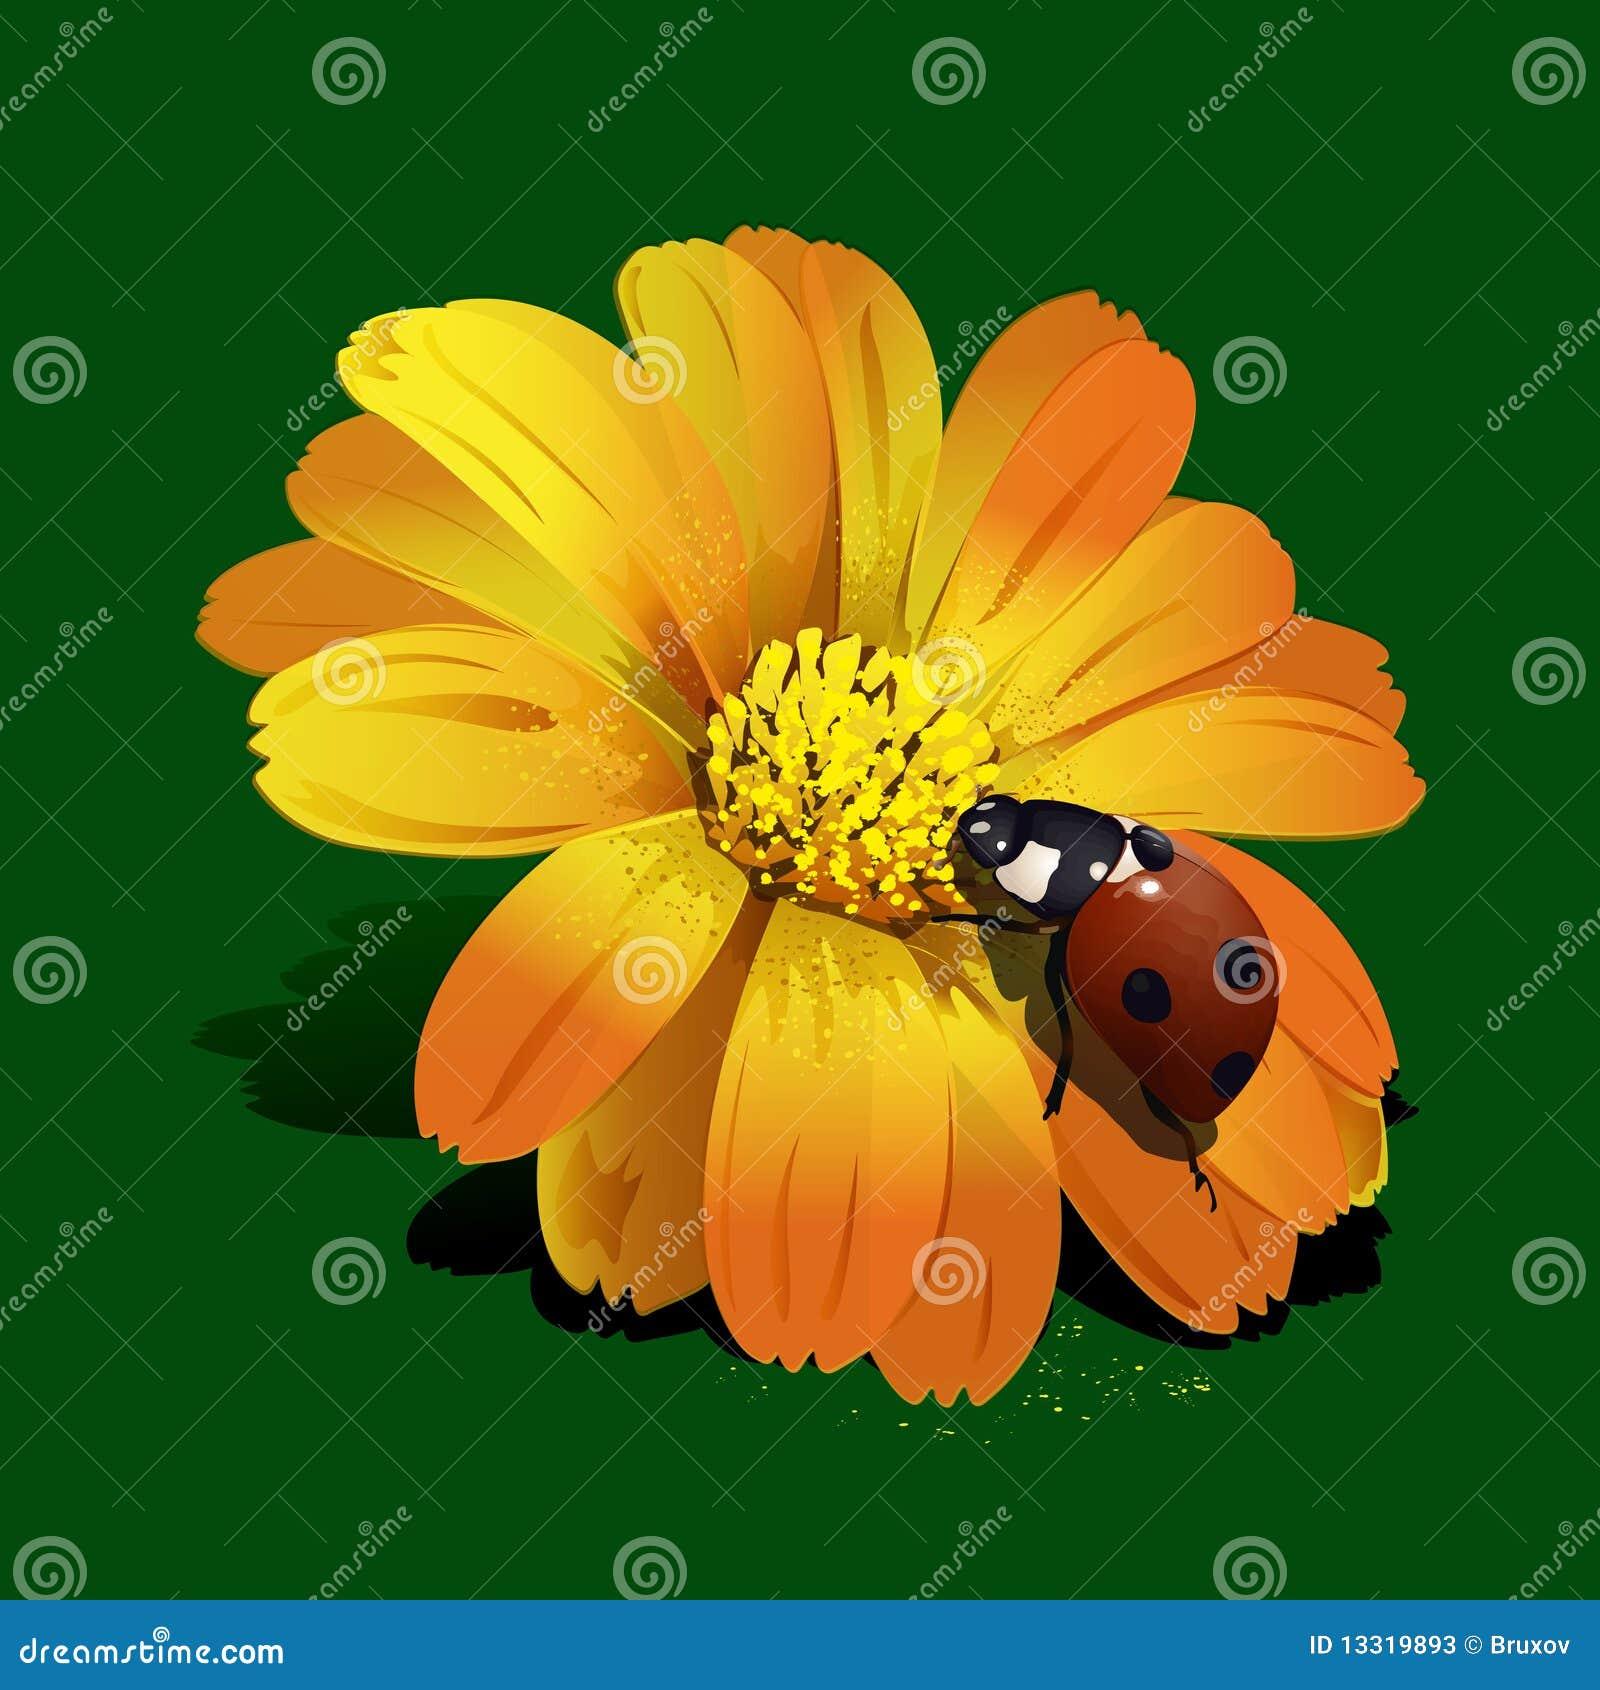 https://thumbs.dreamstime.com/z/ladybird-flower-13319893.jpg